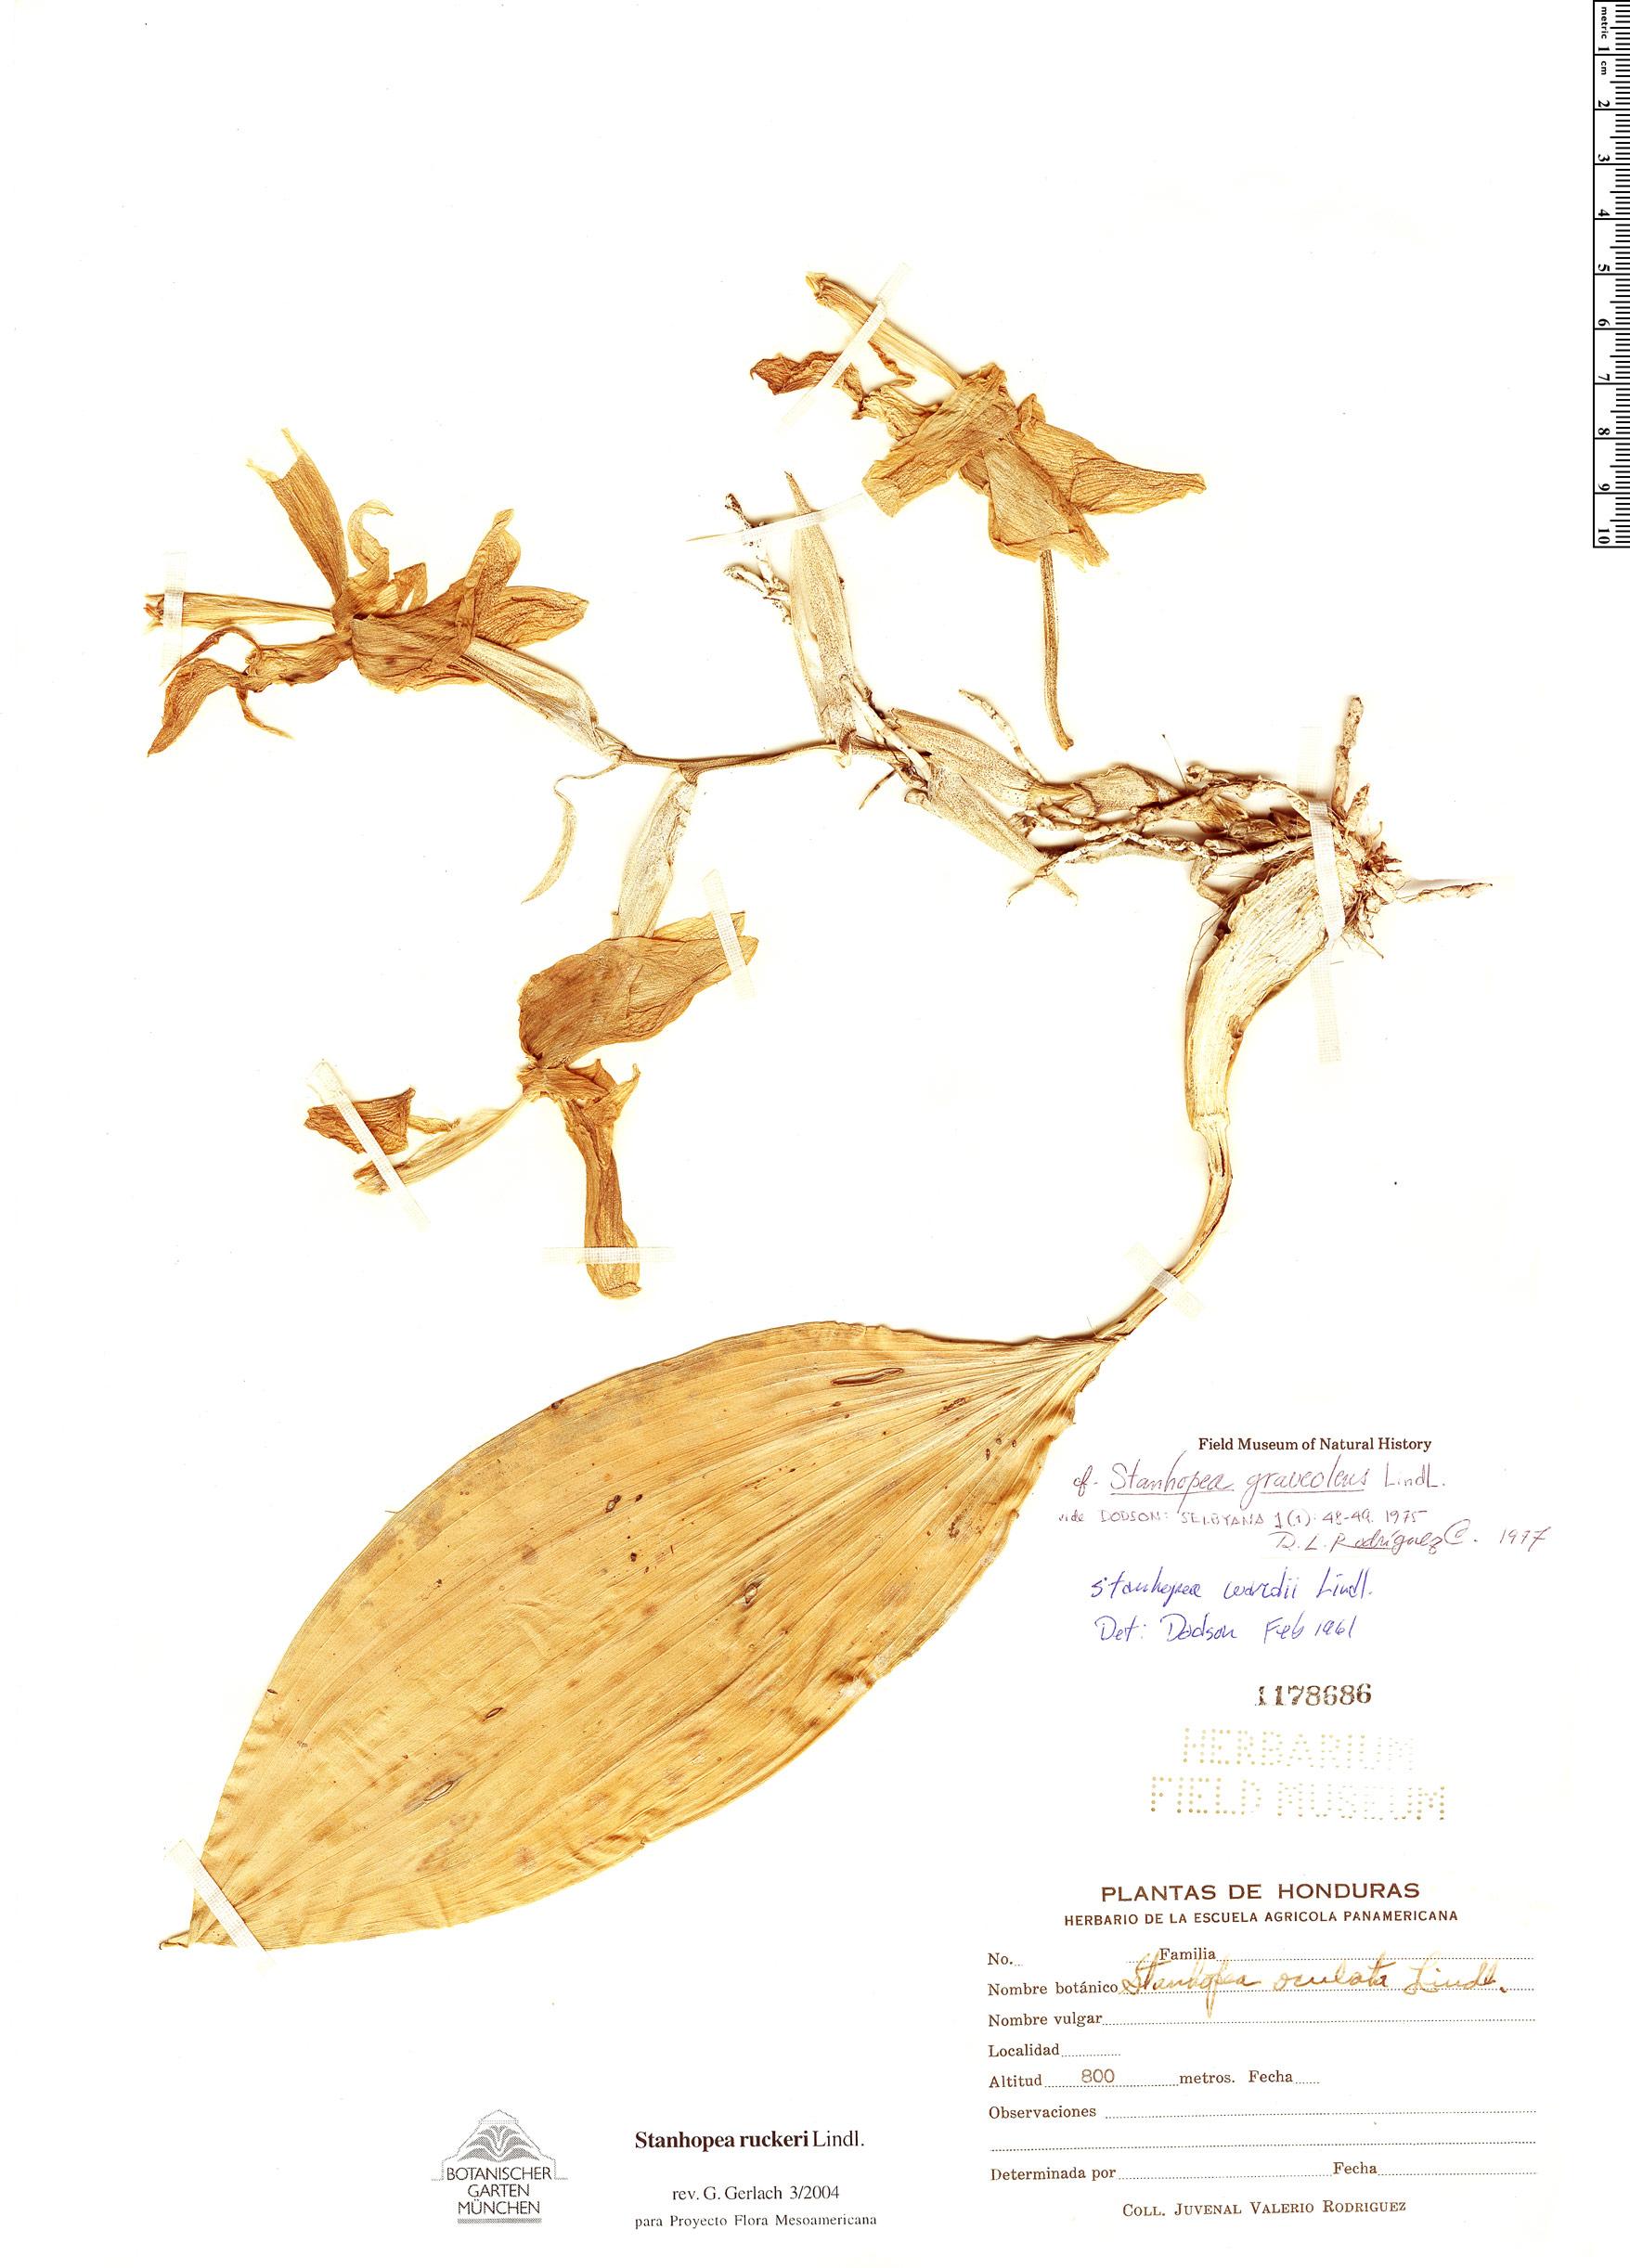 Specimen: Stanhopea ruckeri